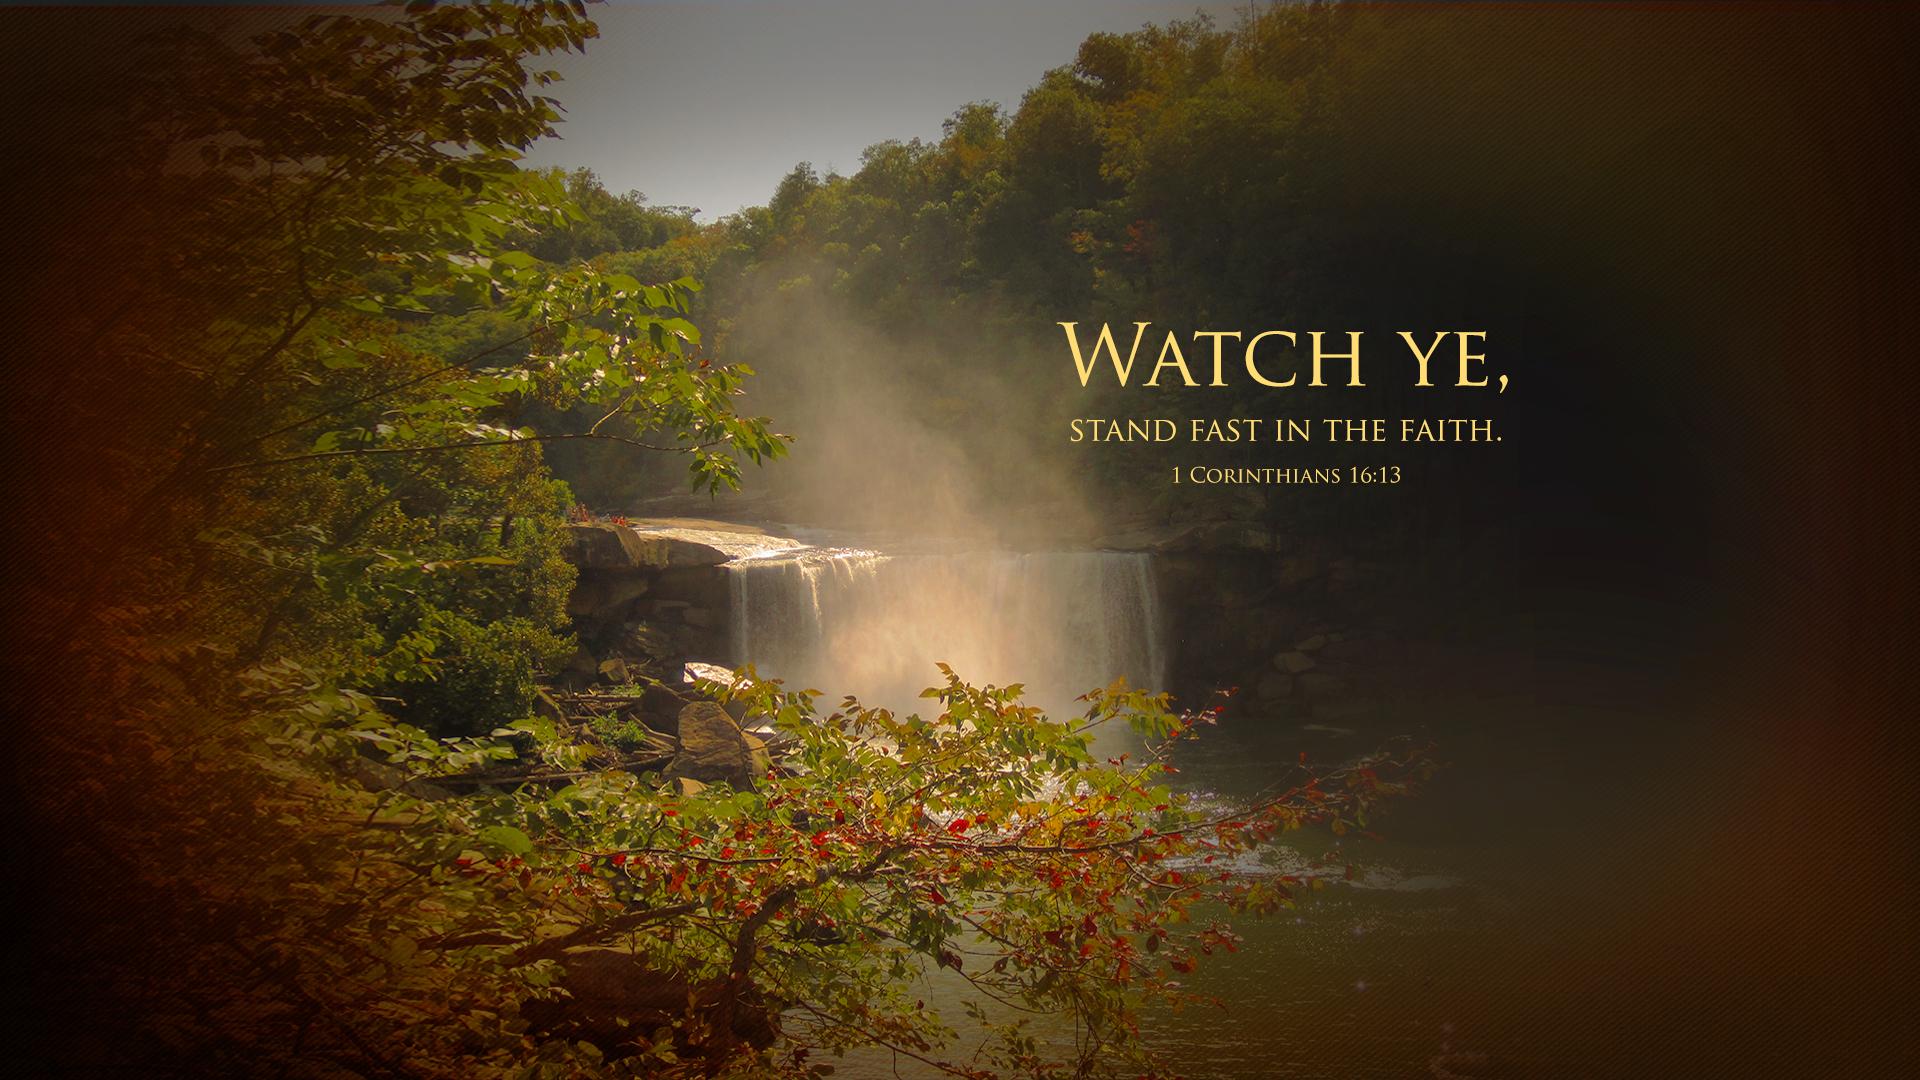 Cumberland Falls KY–1 Corinthians 16:13–Wallpaper